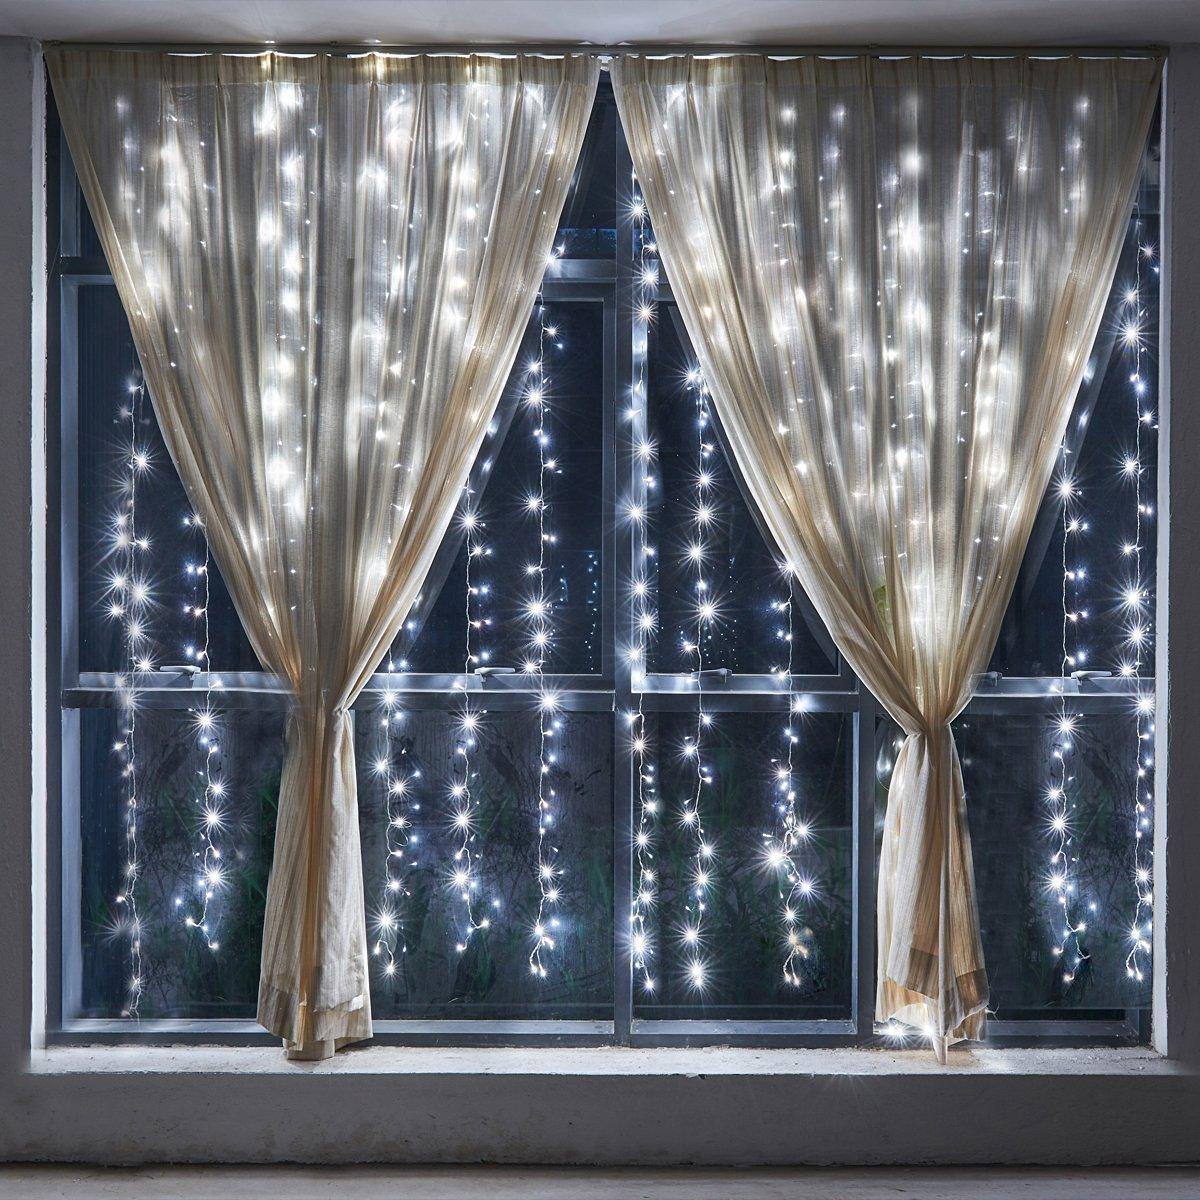 3x3m 300led lichternetz vorhang au en innen lichter netz. Black Bedroom Furniture Sets. Home Design Ideas